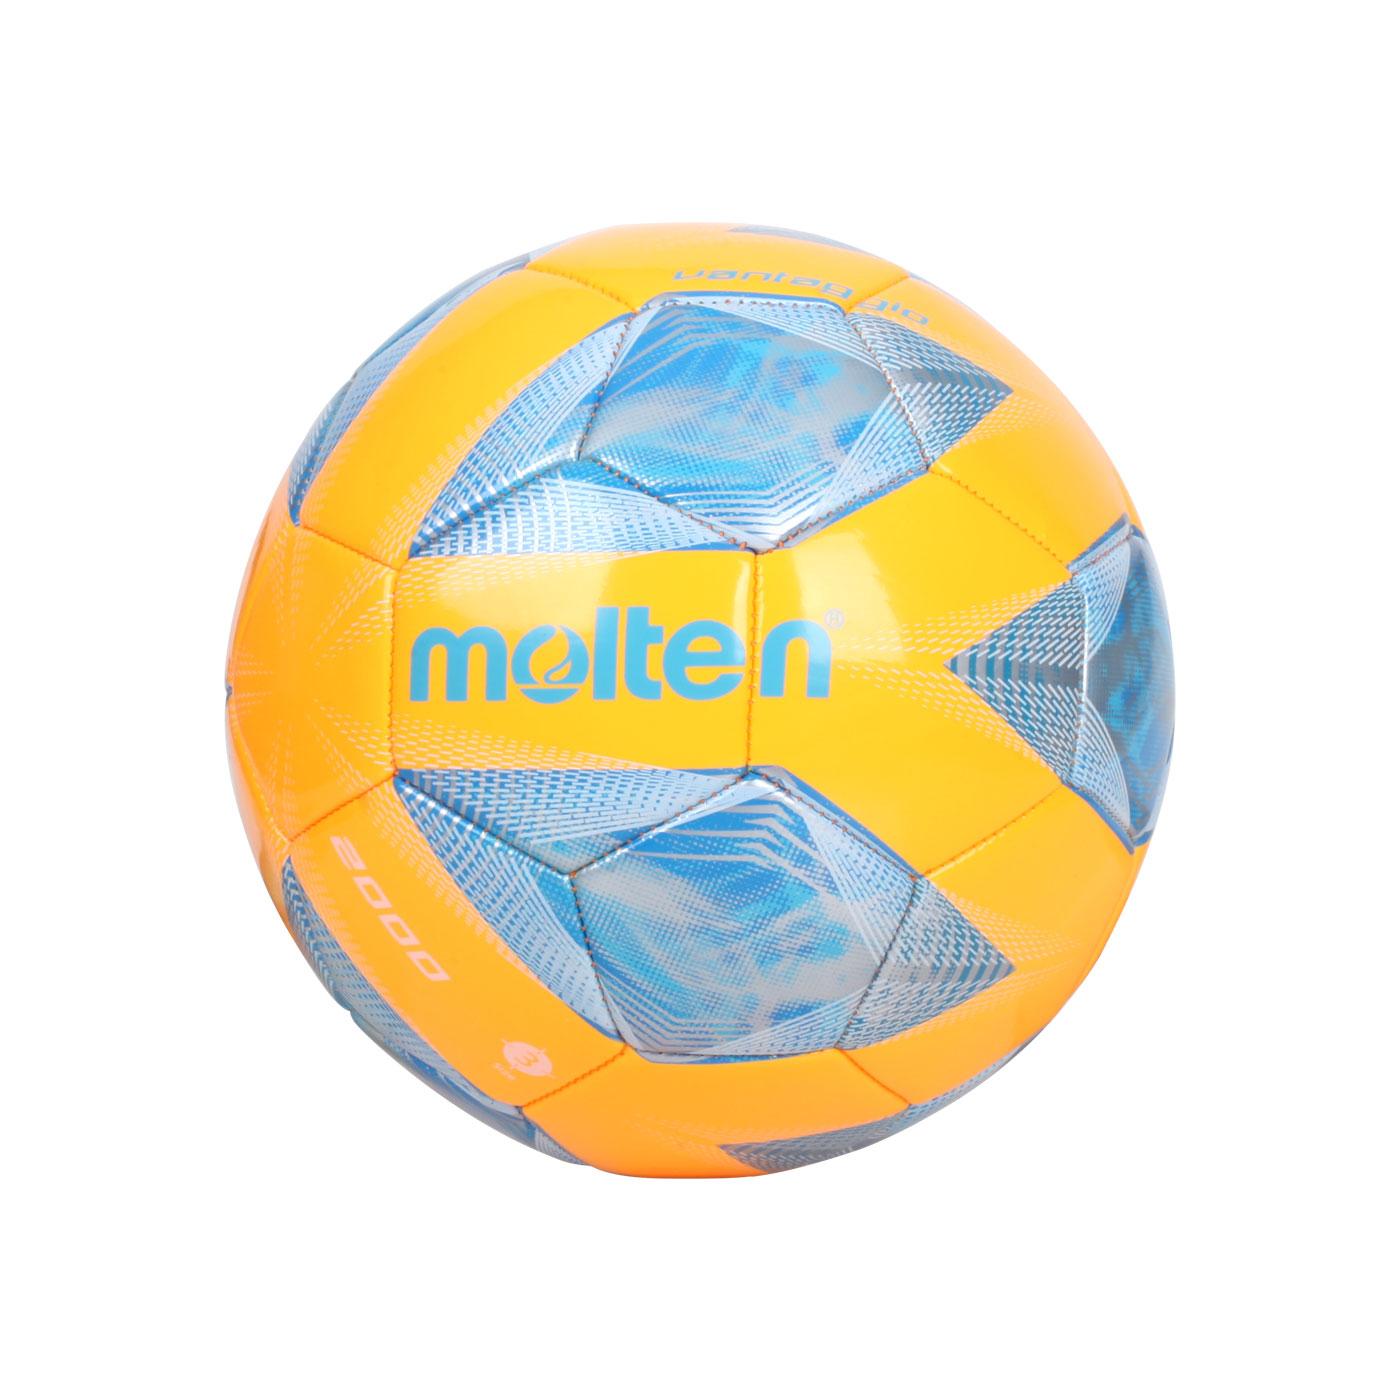 Molten #3合成皮足球 F3A2000 - 橘藍銀